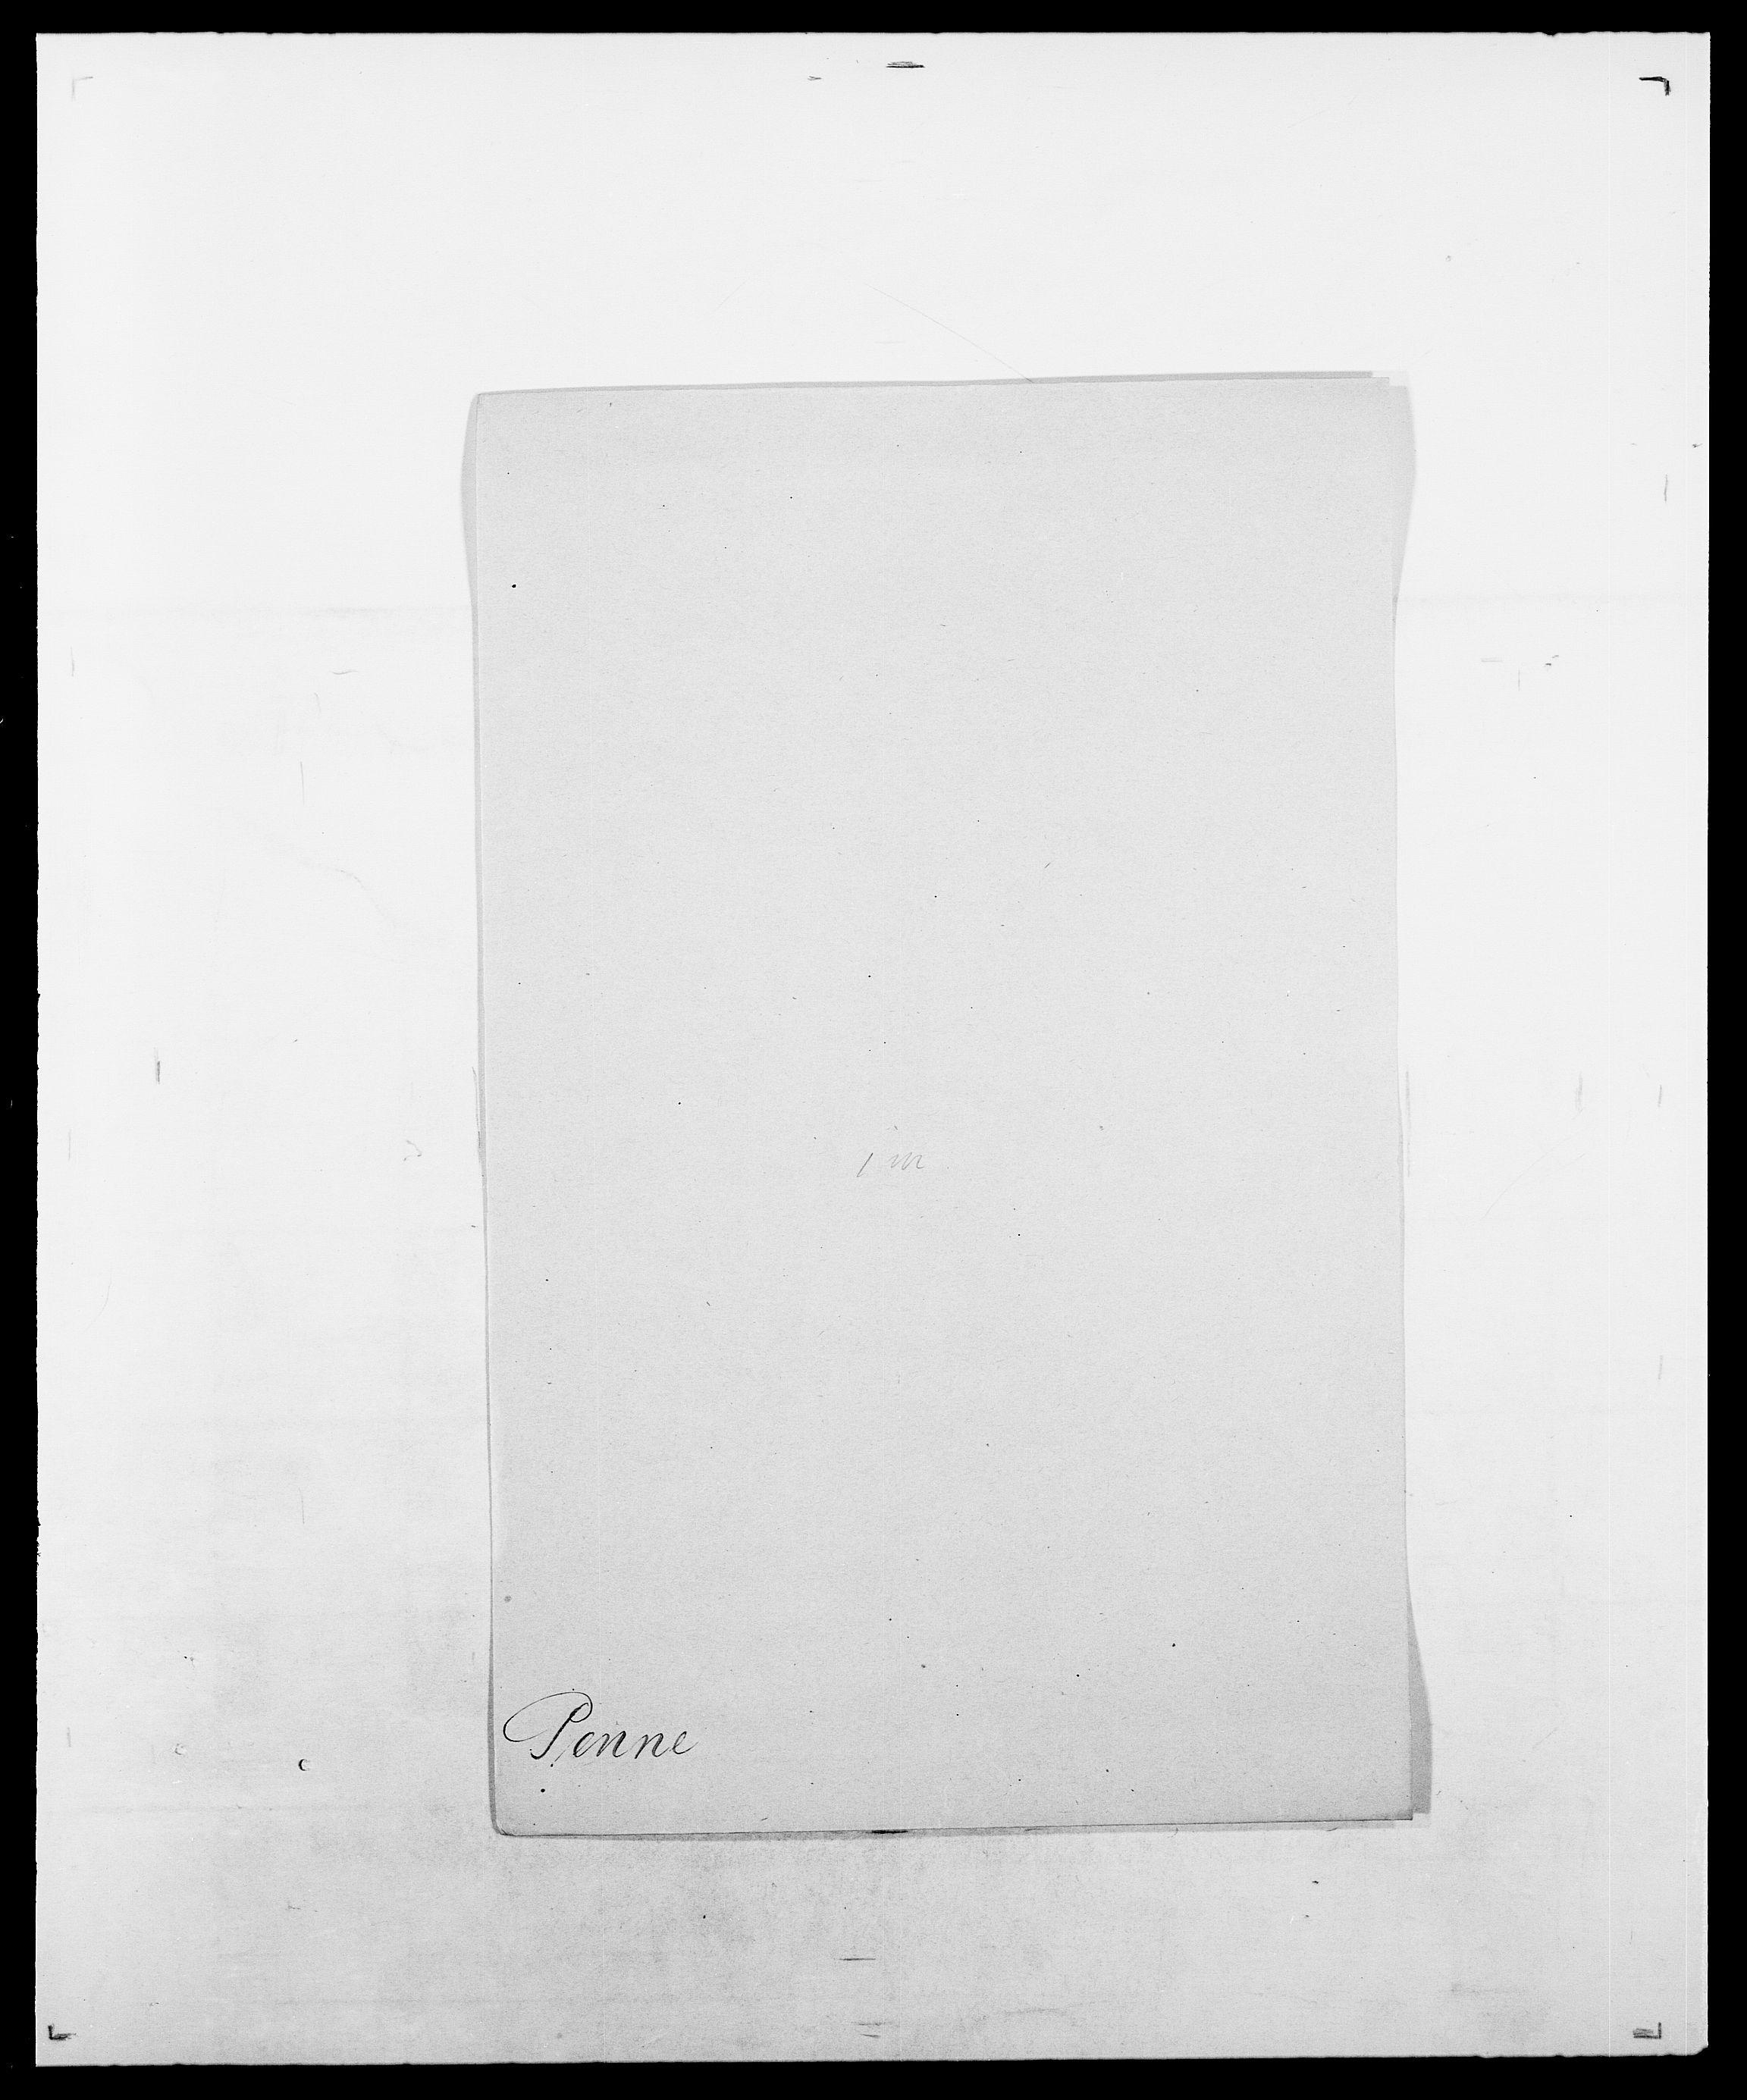 SAO, Delgobe, Charles Antoine - samling, D/Da/L0030: Paars - Pittelkov, s. 347